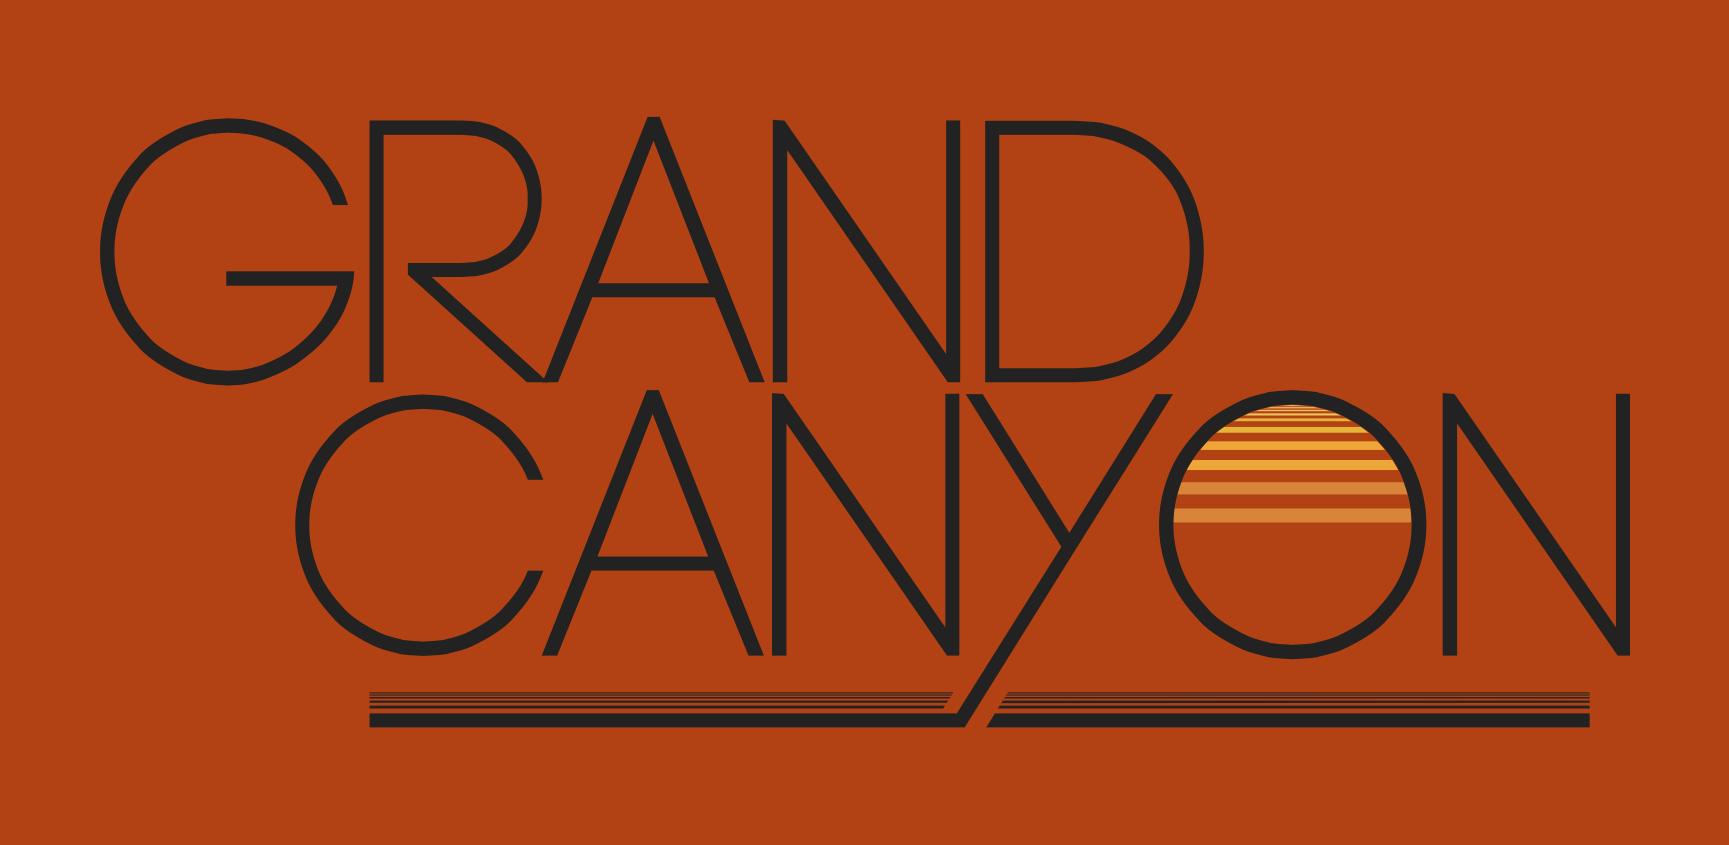 Grand Canyon logo